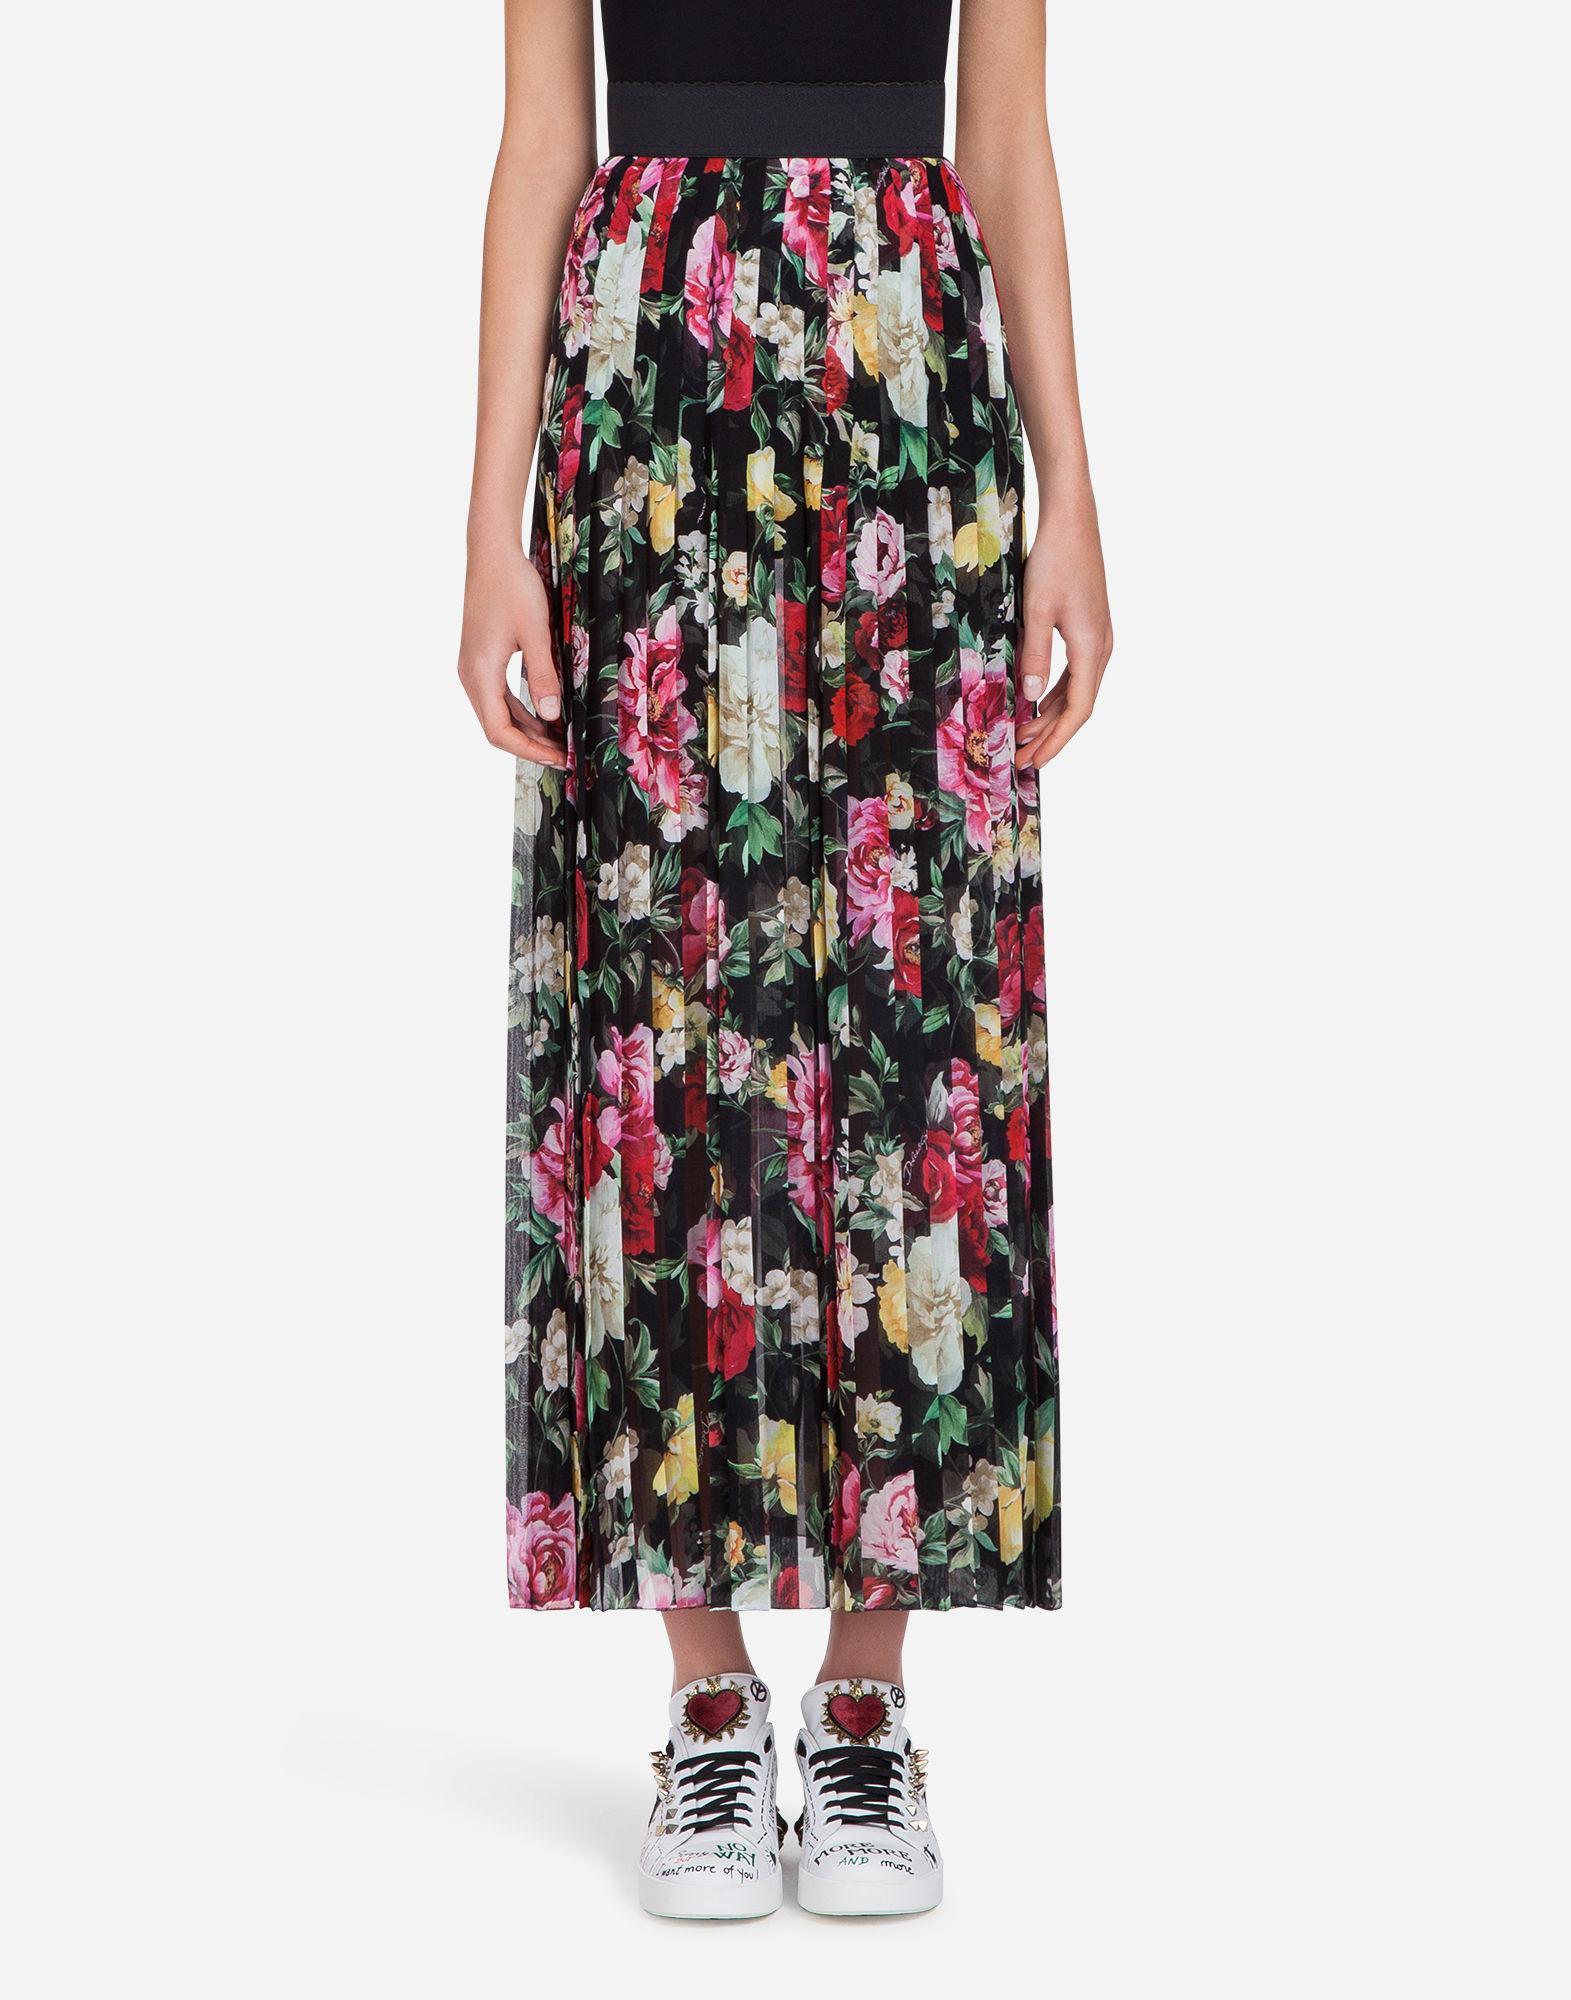 Dolce & Gabbana Printed Skirt In Silk Georgette In Black